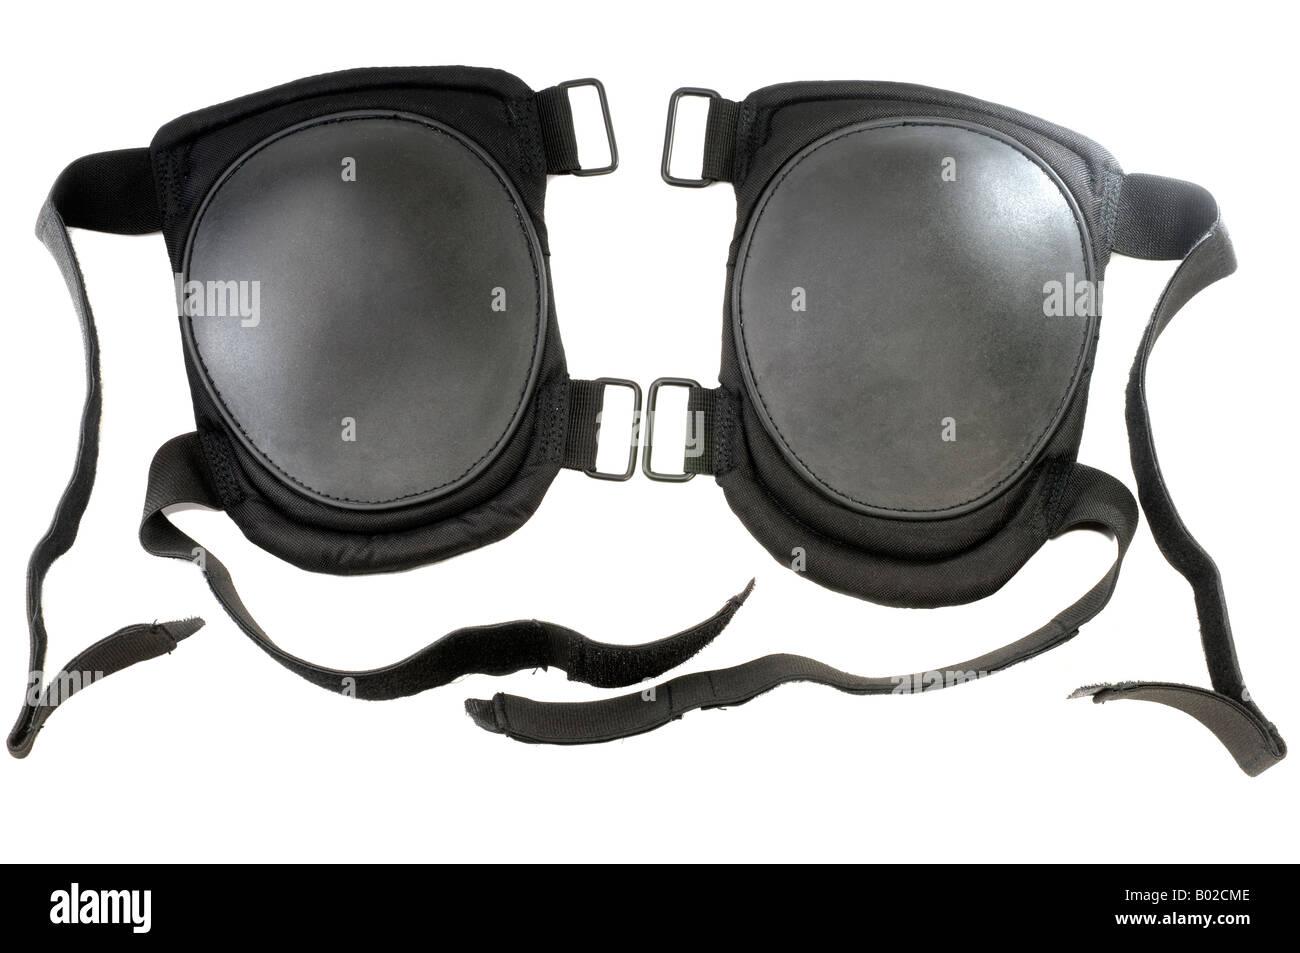 Pair of black velcro fastening knee cap pads - Stock Image